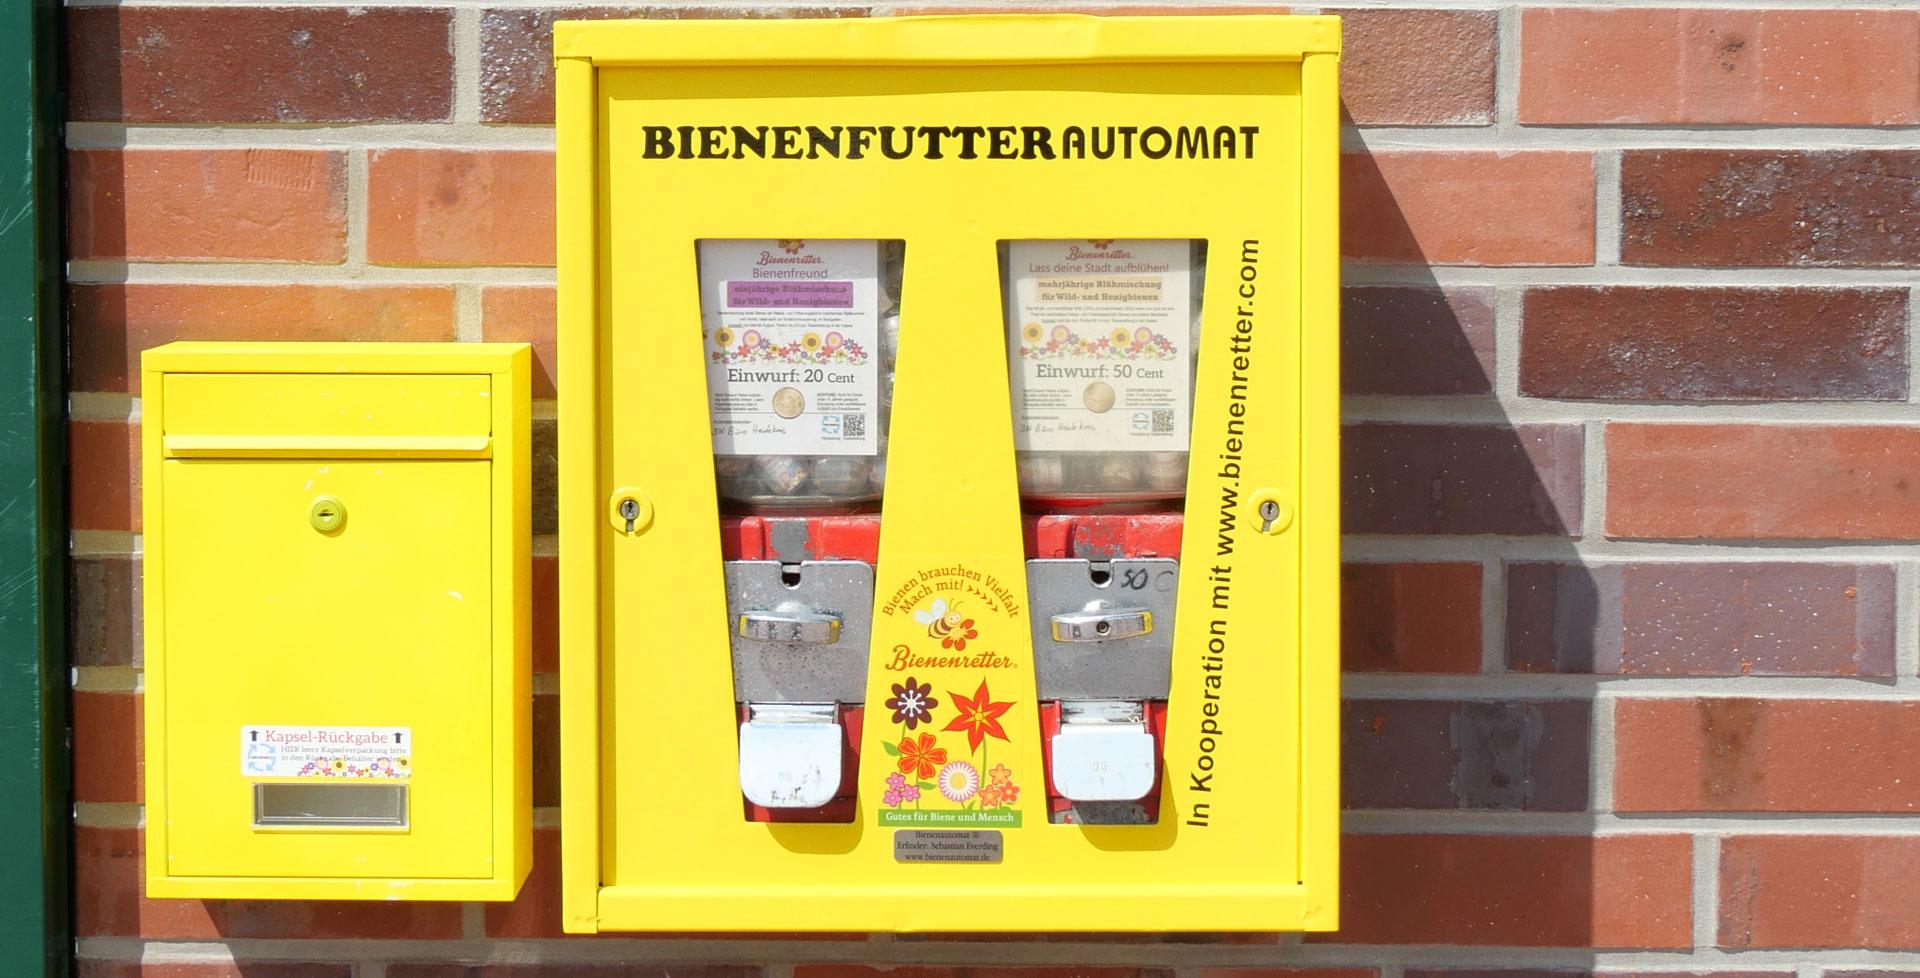 Bienenrettung aus dem Kaugummi-Automaten